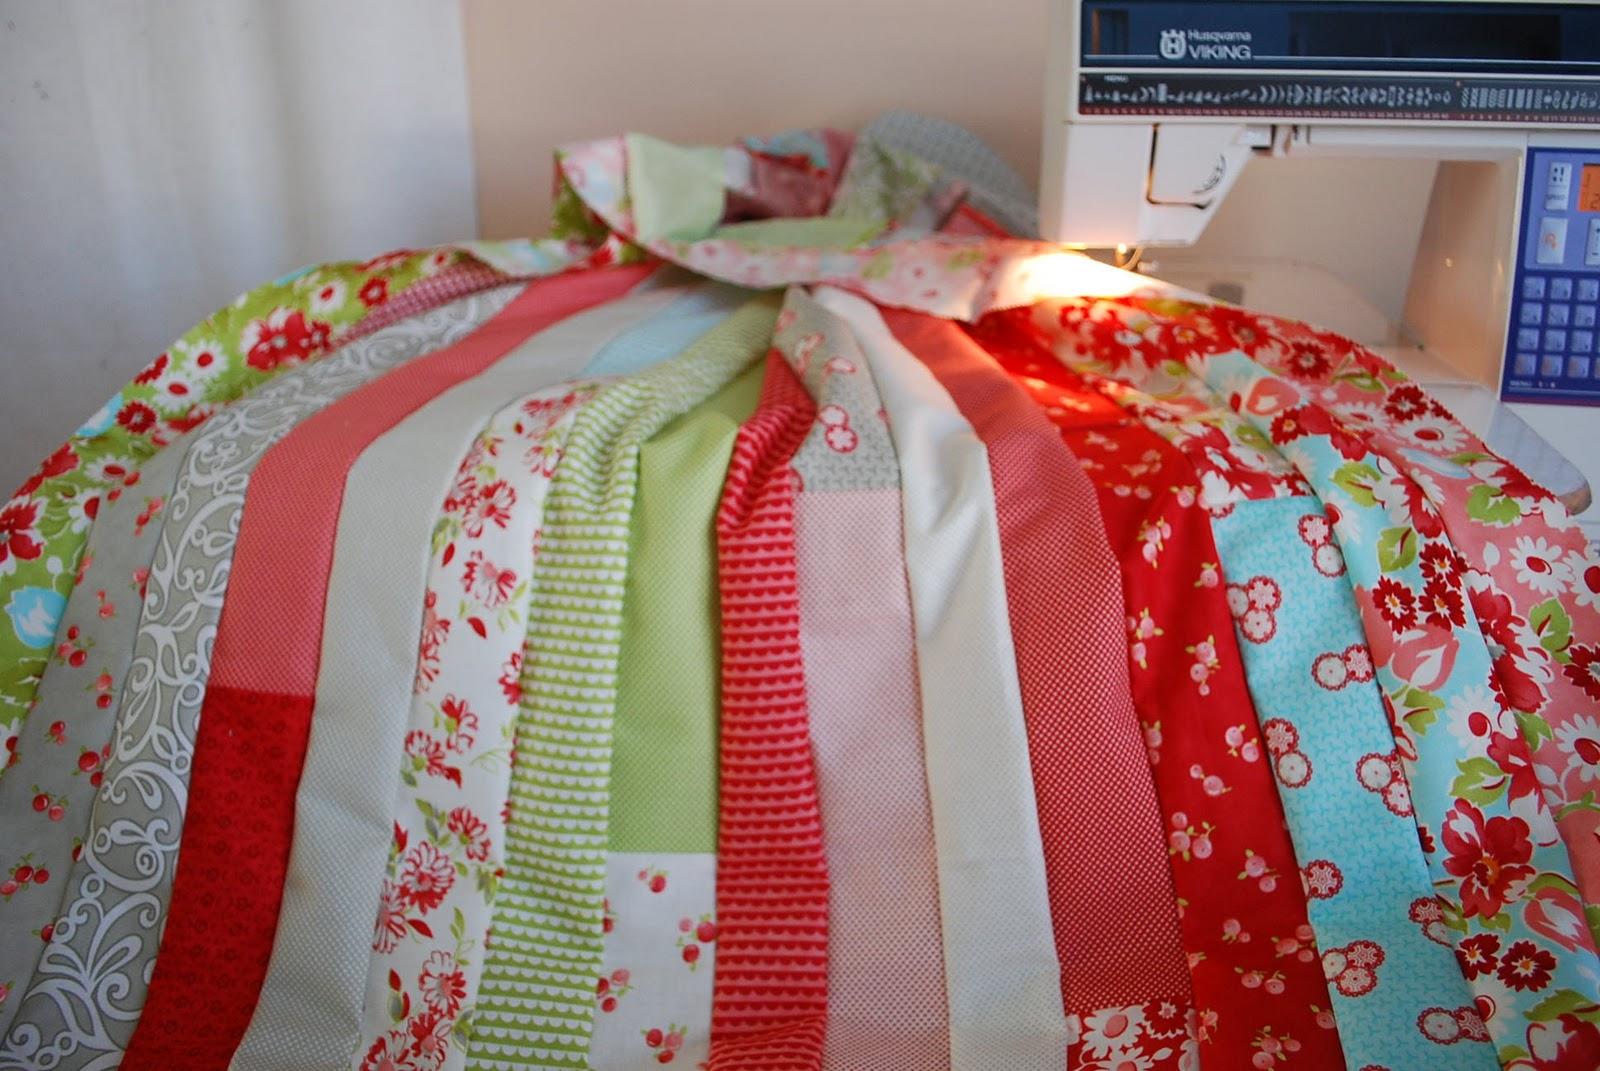 Crafty Garden Mom: Jelly Roll Race Quilt + Tutorial : jelly roll race quilt pattern - Adamdwight.com